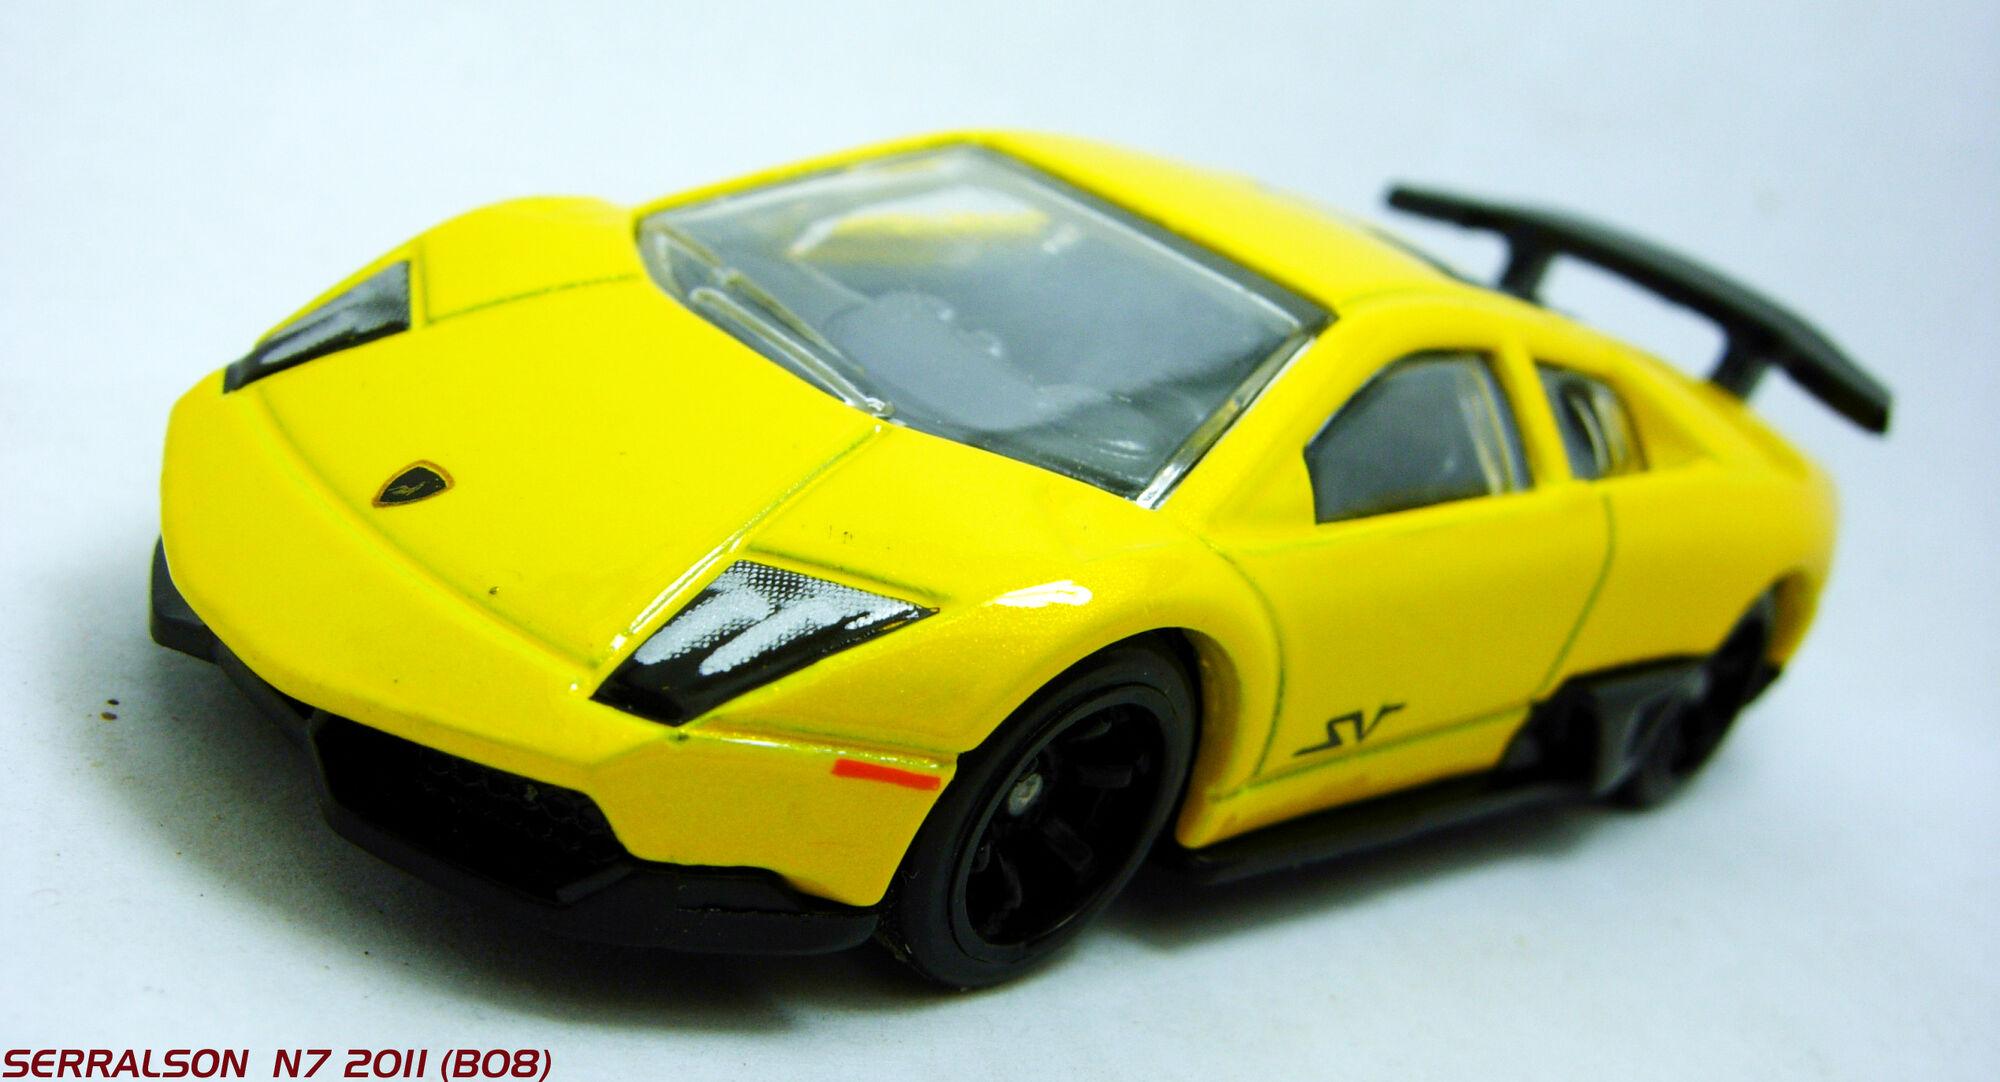 2000?cb=20110303121421 Surprising Lamborghini Gallardo Hot Wheels Wiki Cars Trend